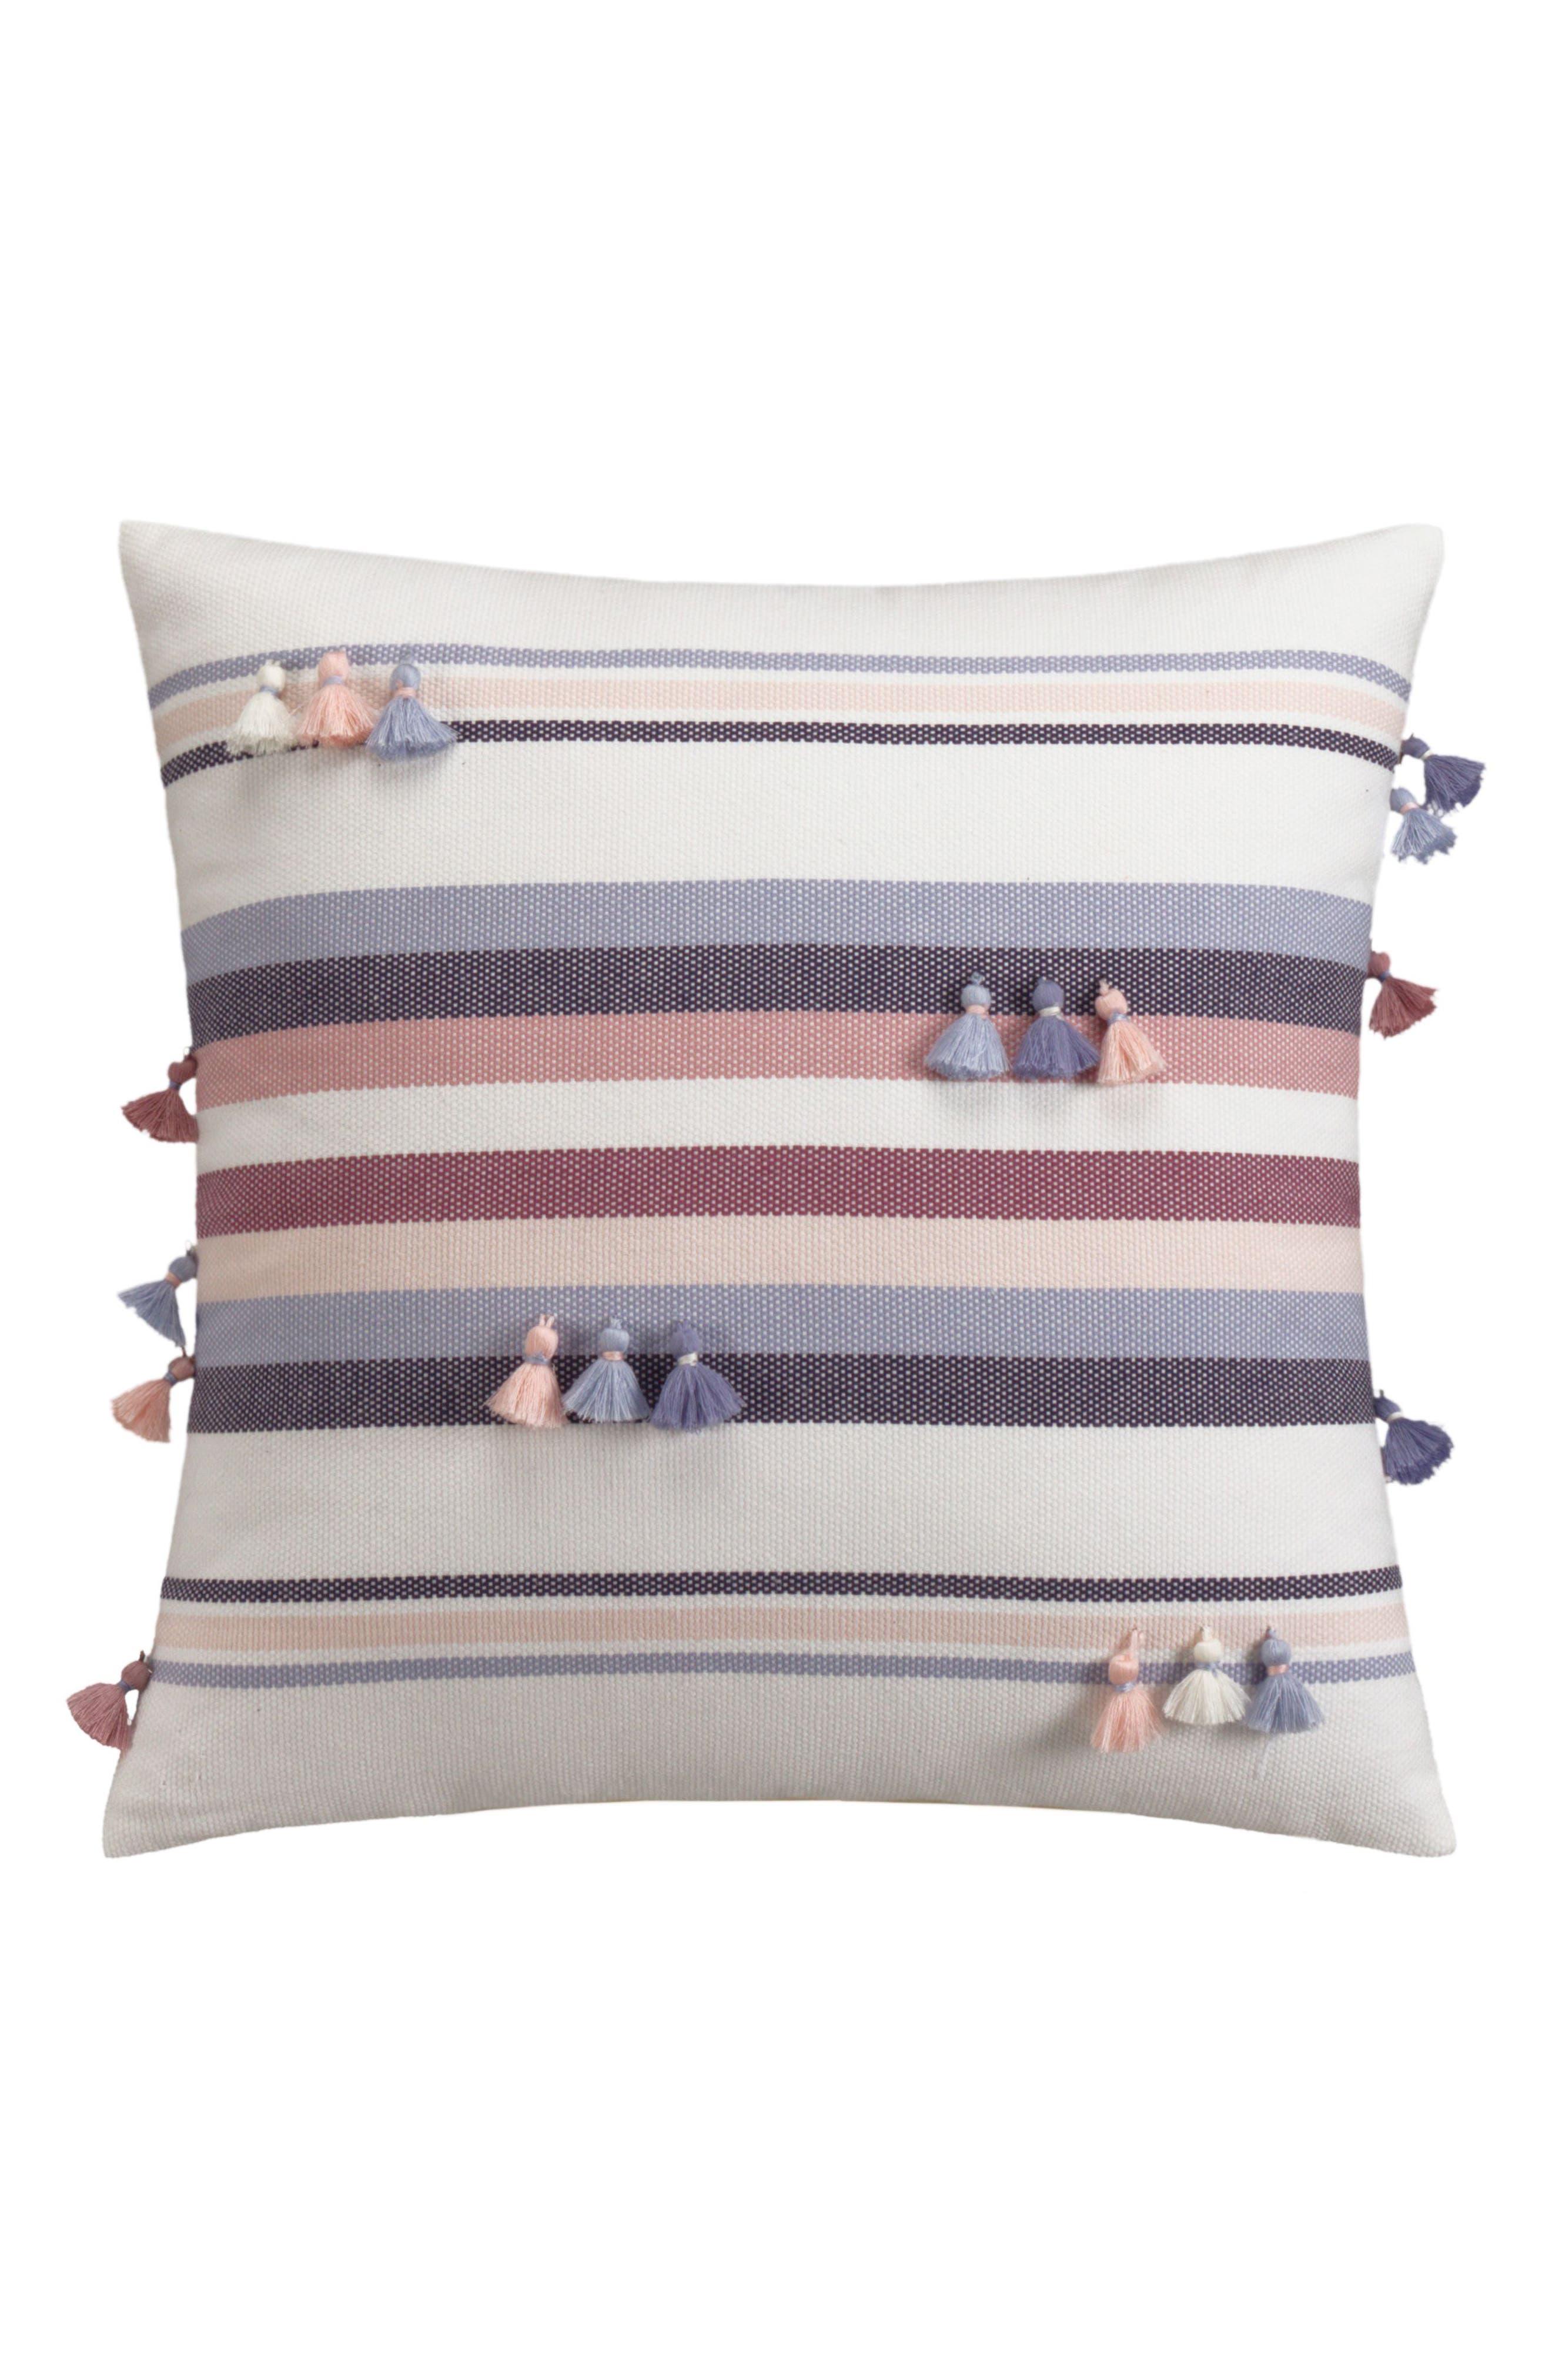 Tassel Stripe Accent Pillow,                             Main thumbnail 1, color,                             Purple Multi